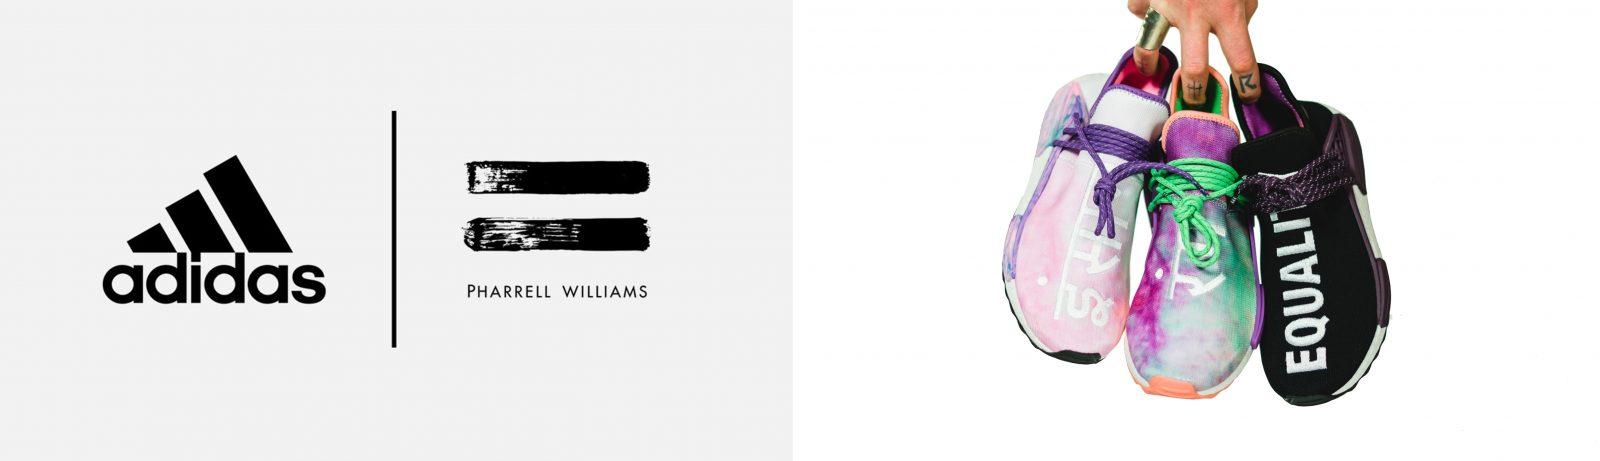 Women's Adidas Pharrell Williams Trainers